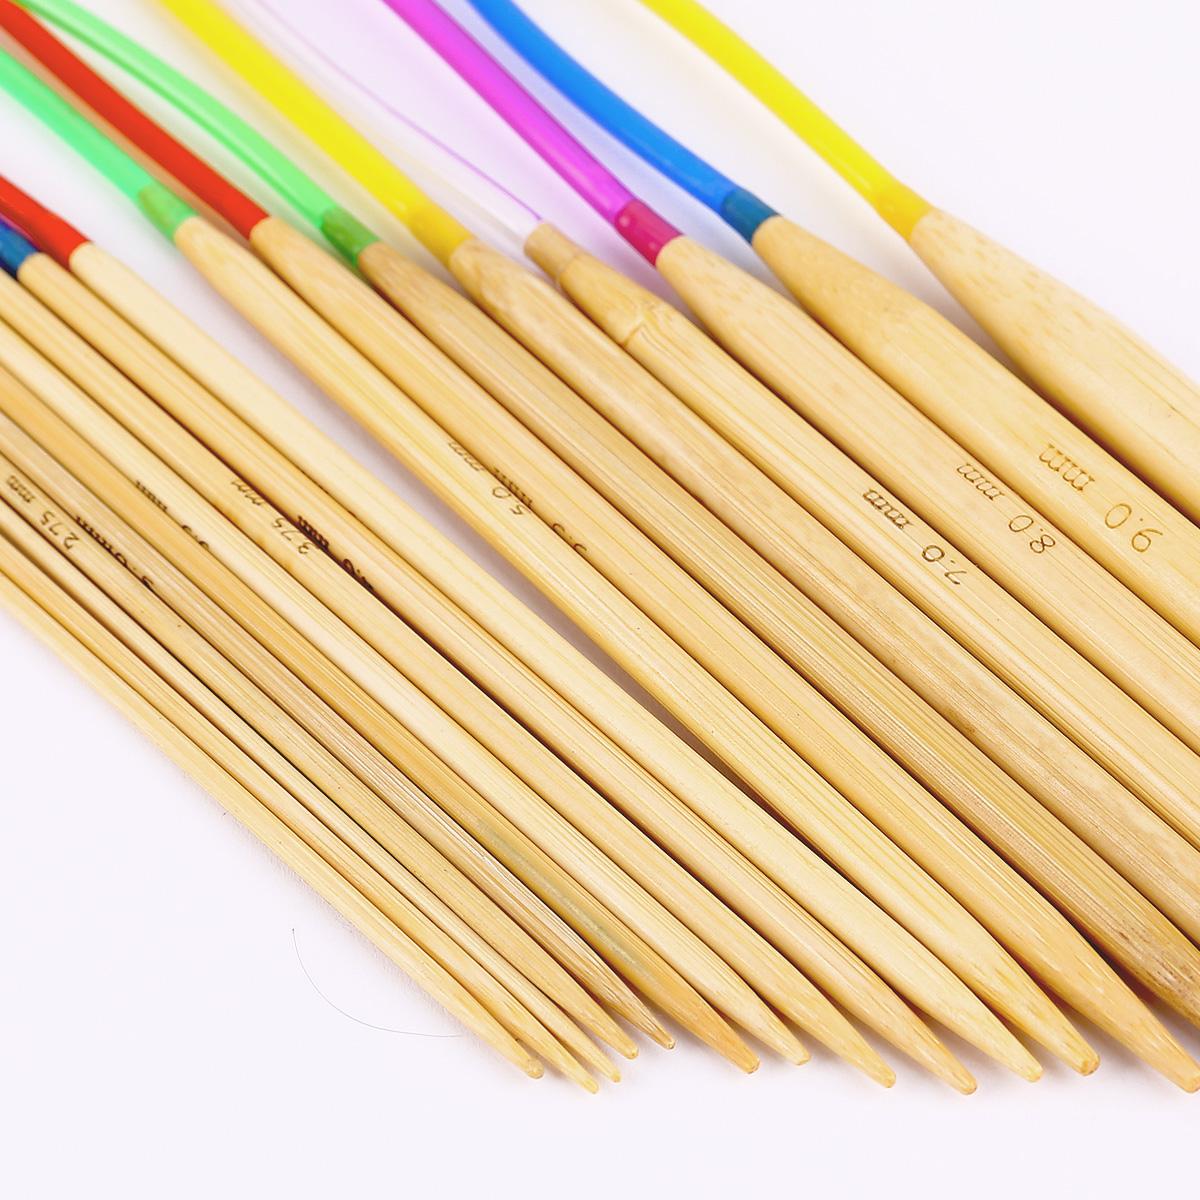 18 x aiguille circulaire pour tricot bambou 2 10mm tube for Bambou plastique